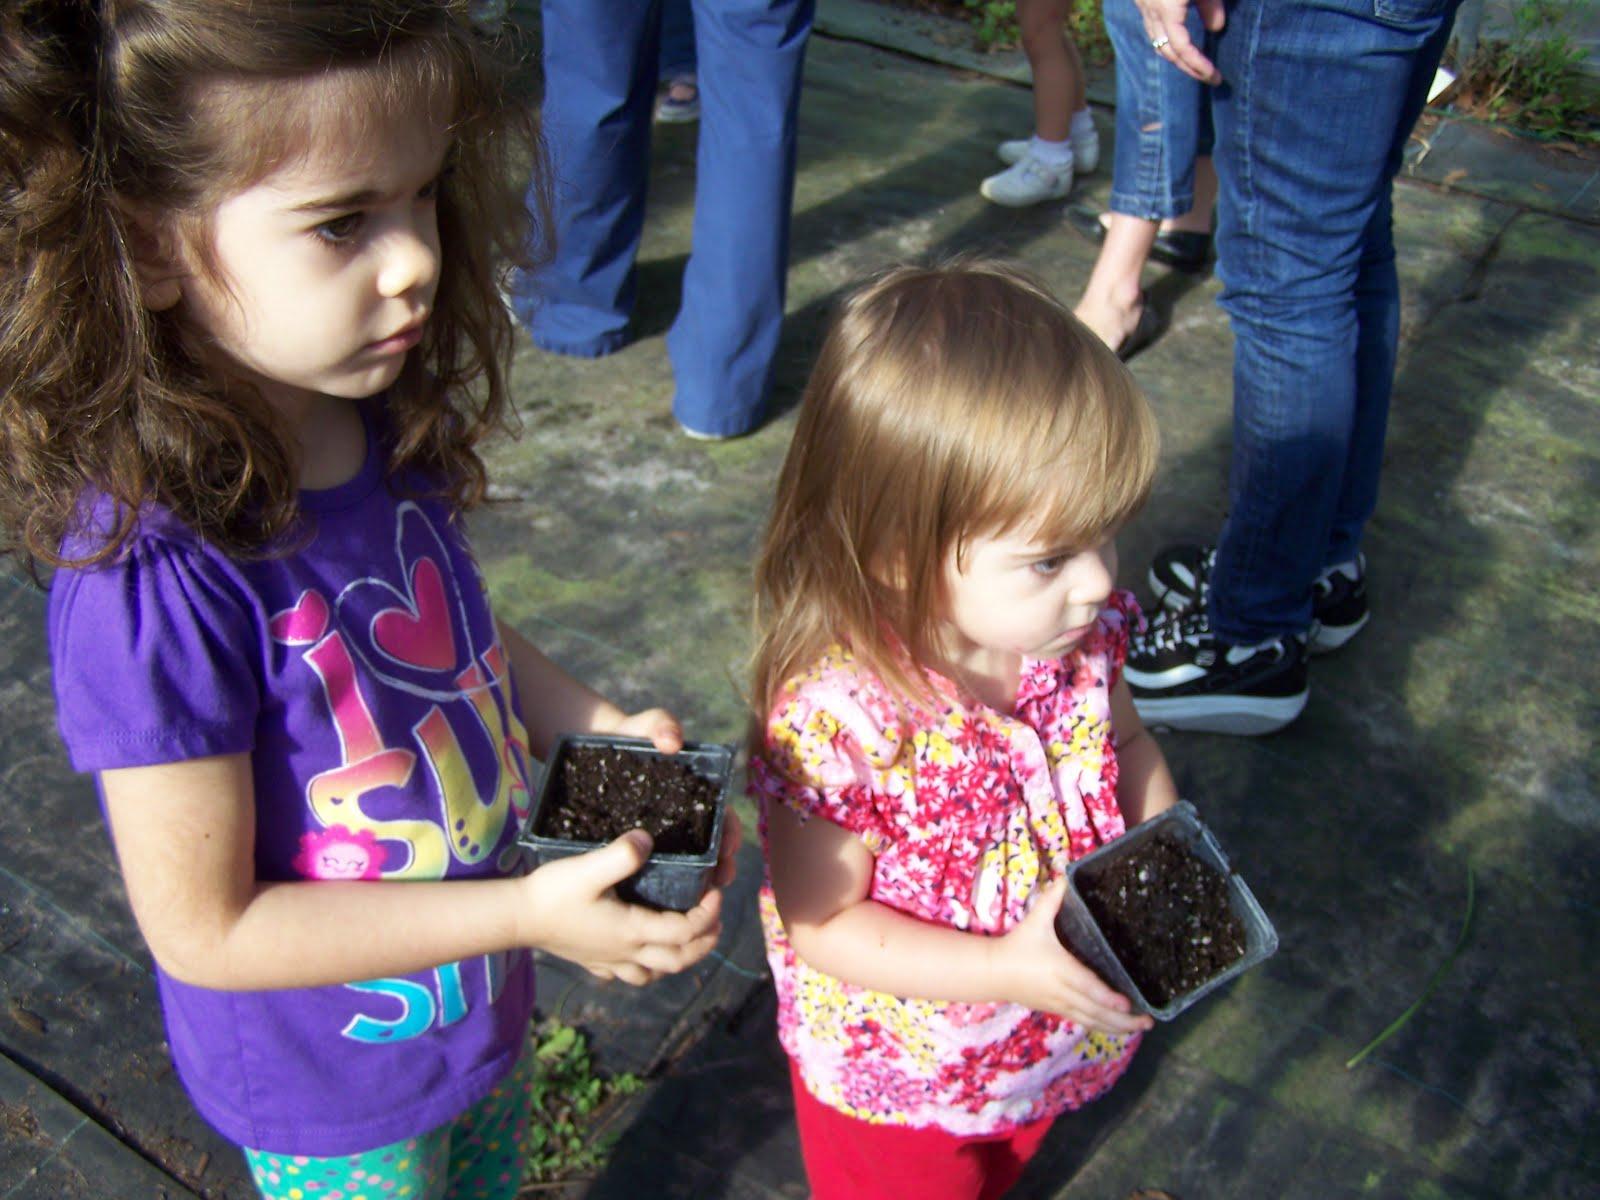 The Mugnaini Family Brownswood Nursery Field Trip